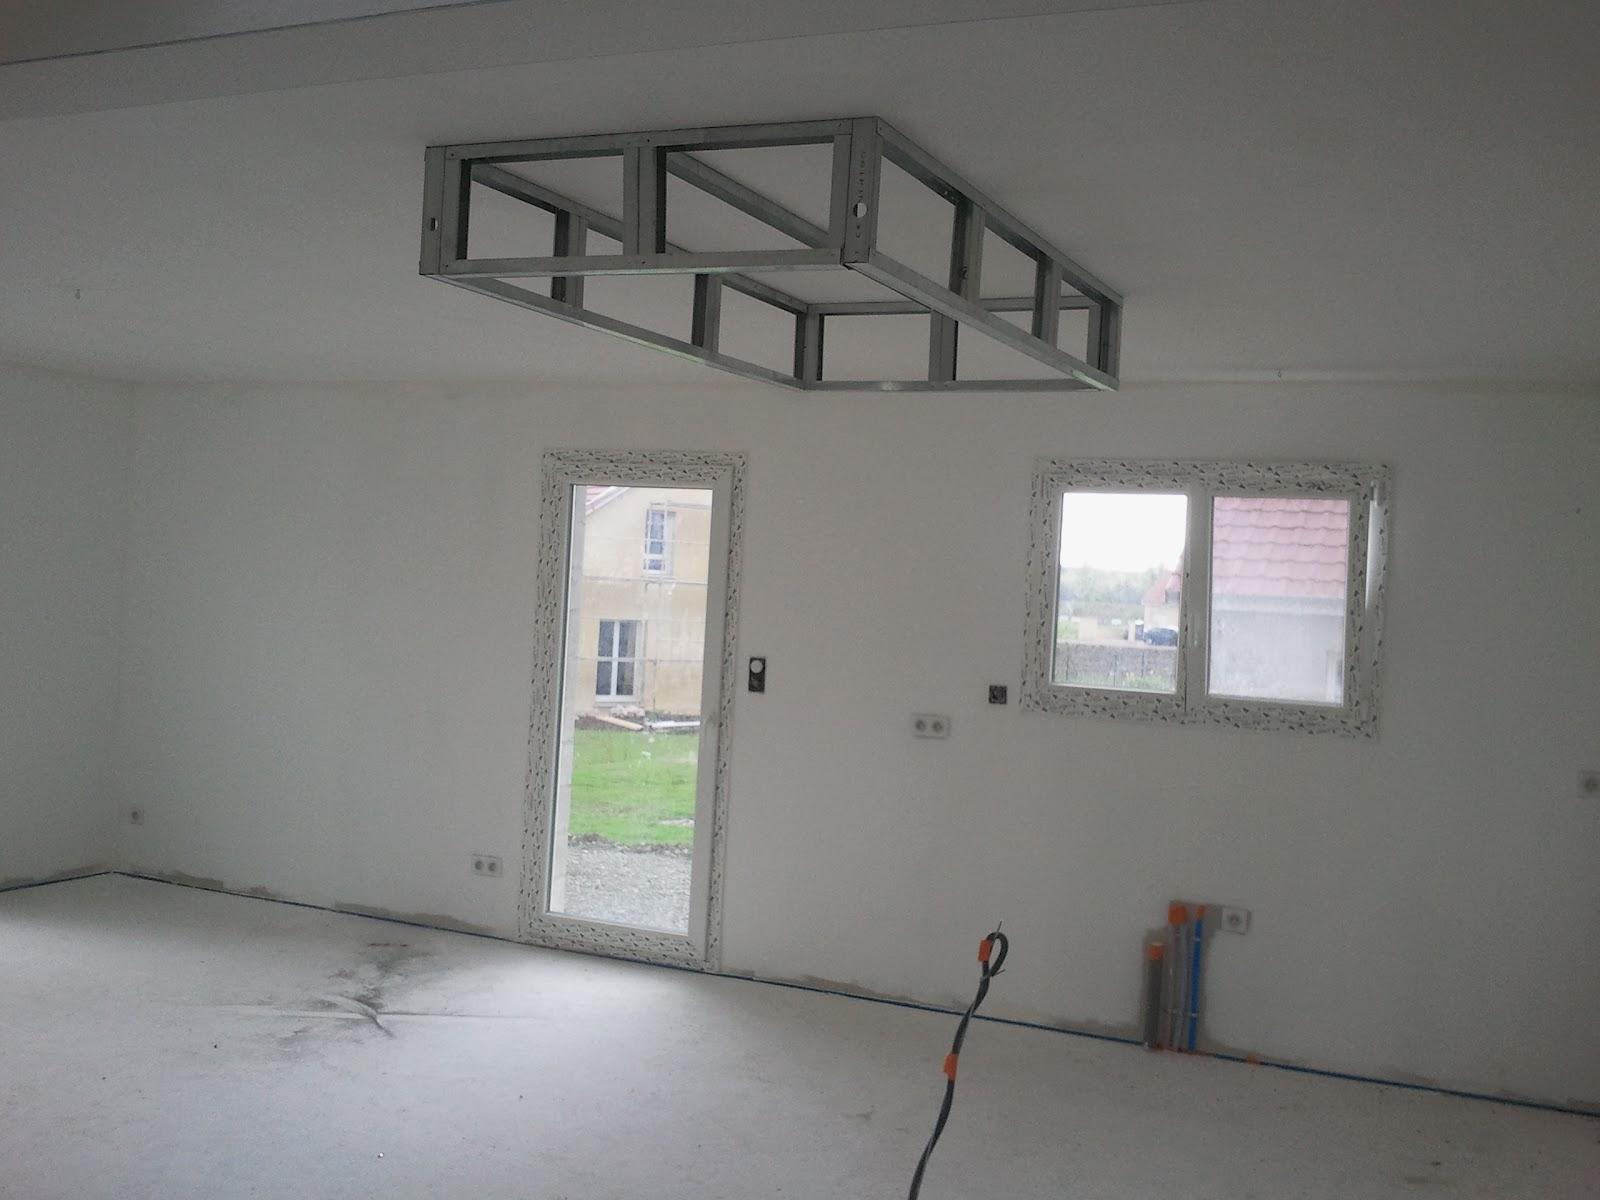 bricolage de l 39 id e la r alisation plafond descendu caisson suspendu. Black Bedroom Furniture Sets. Home Design Ideas